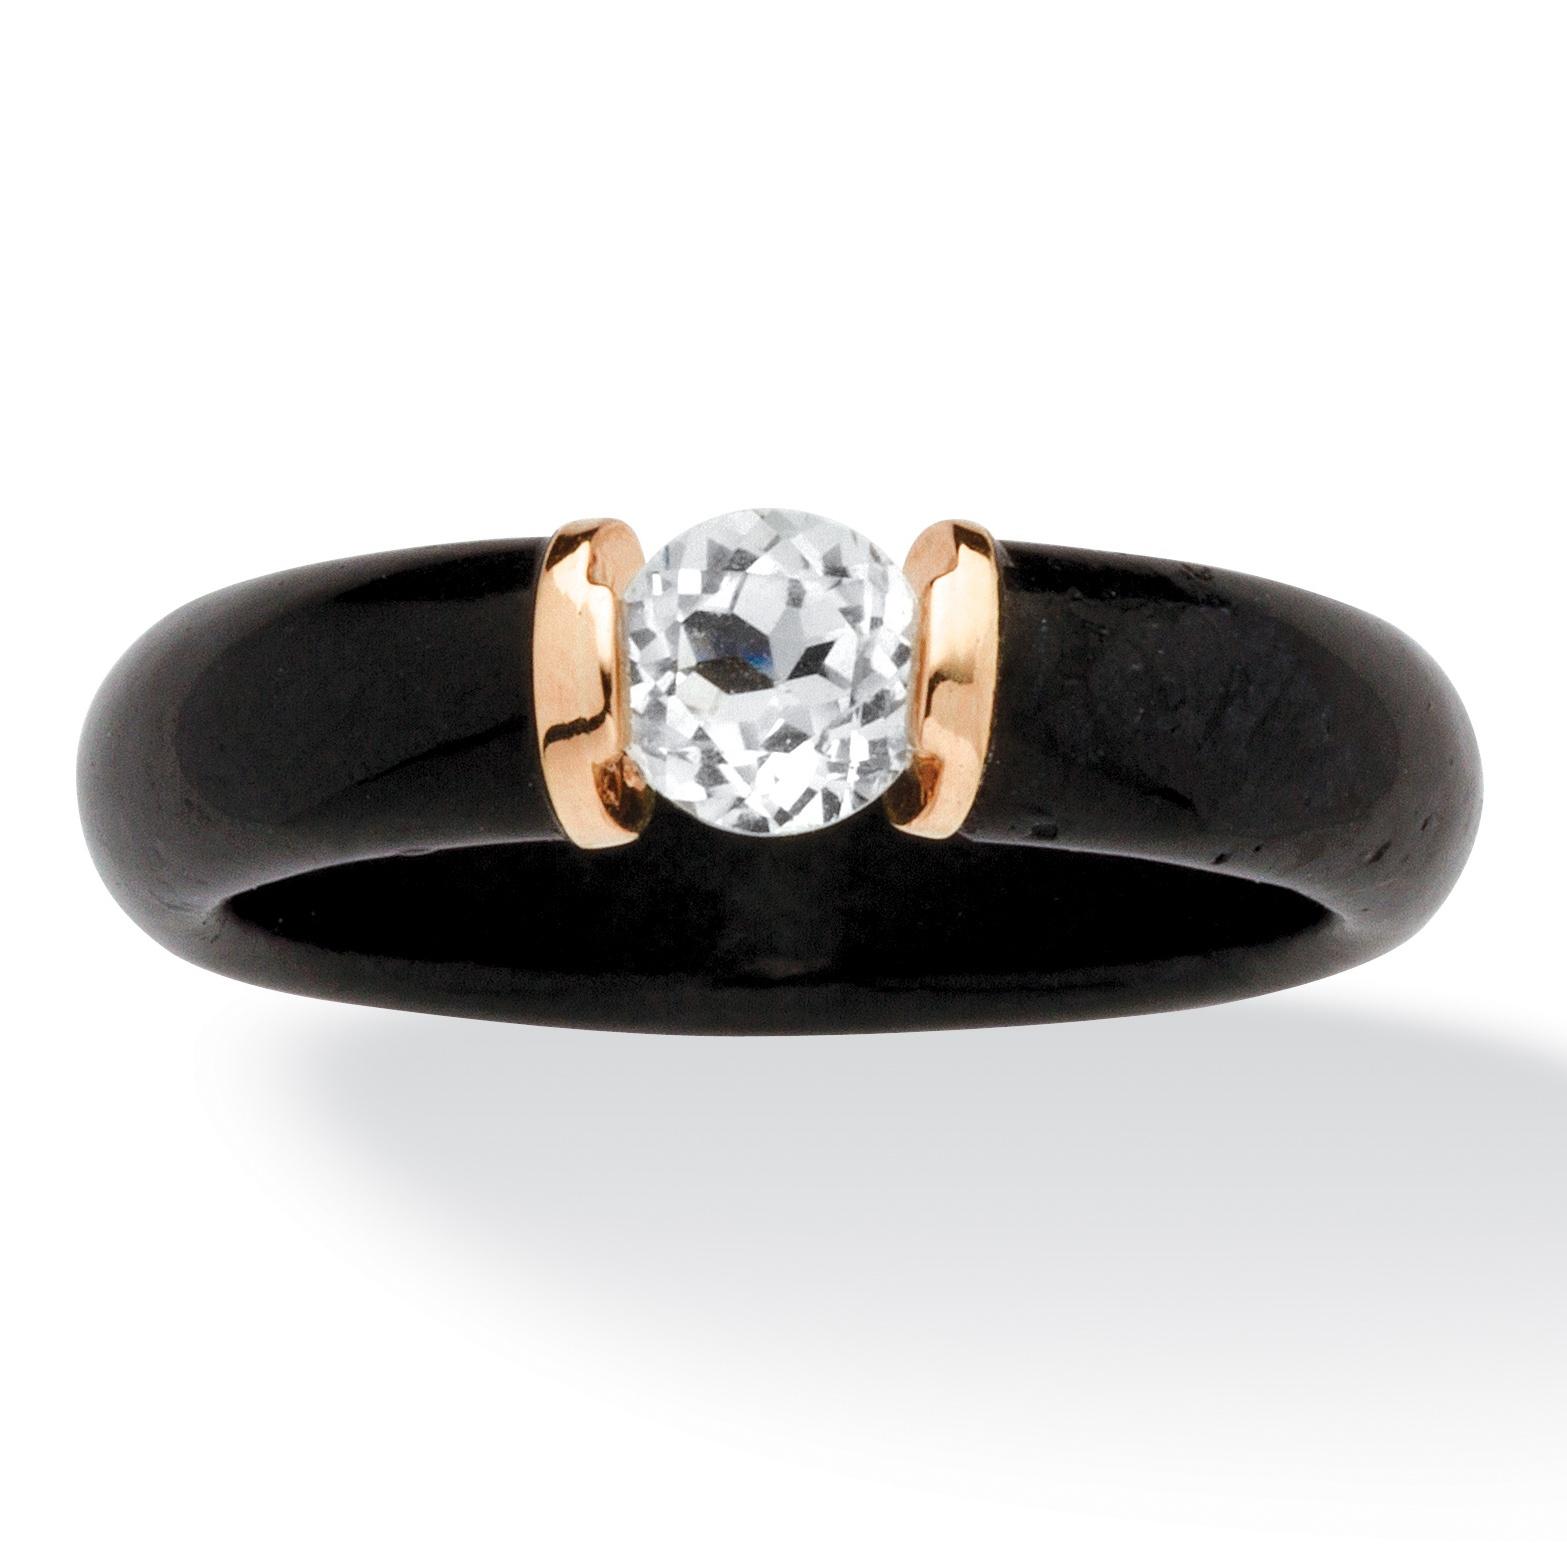 .56 TCW Black Jade and White Topaz Ring in 10k Gold